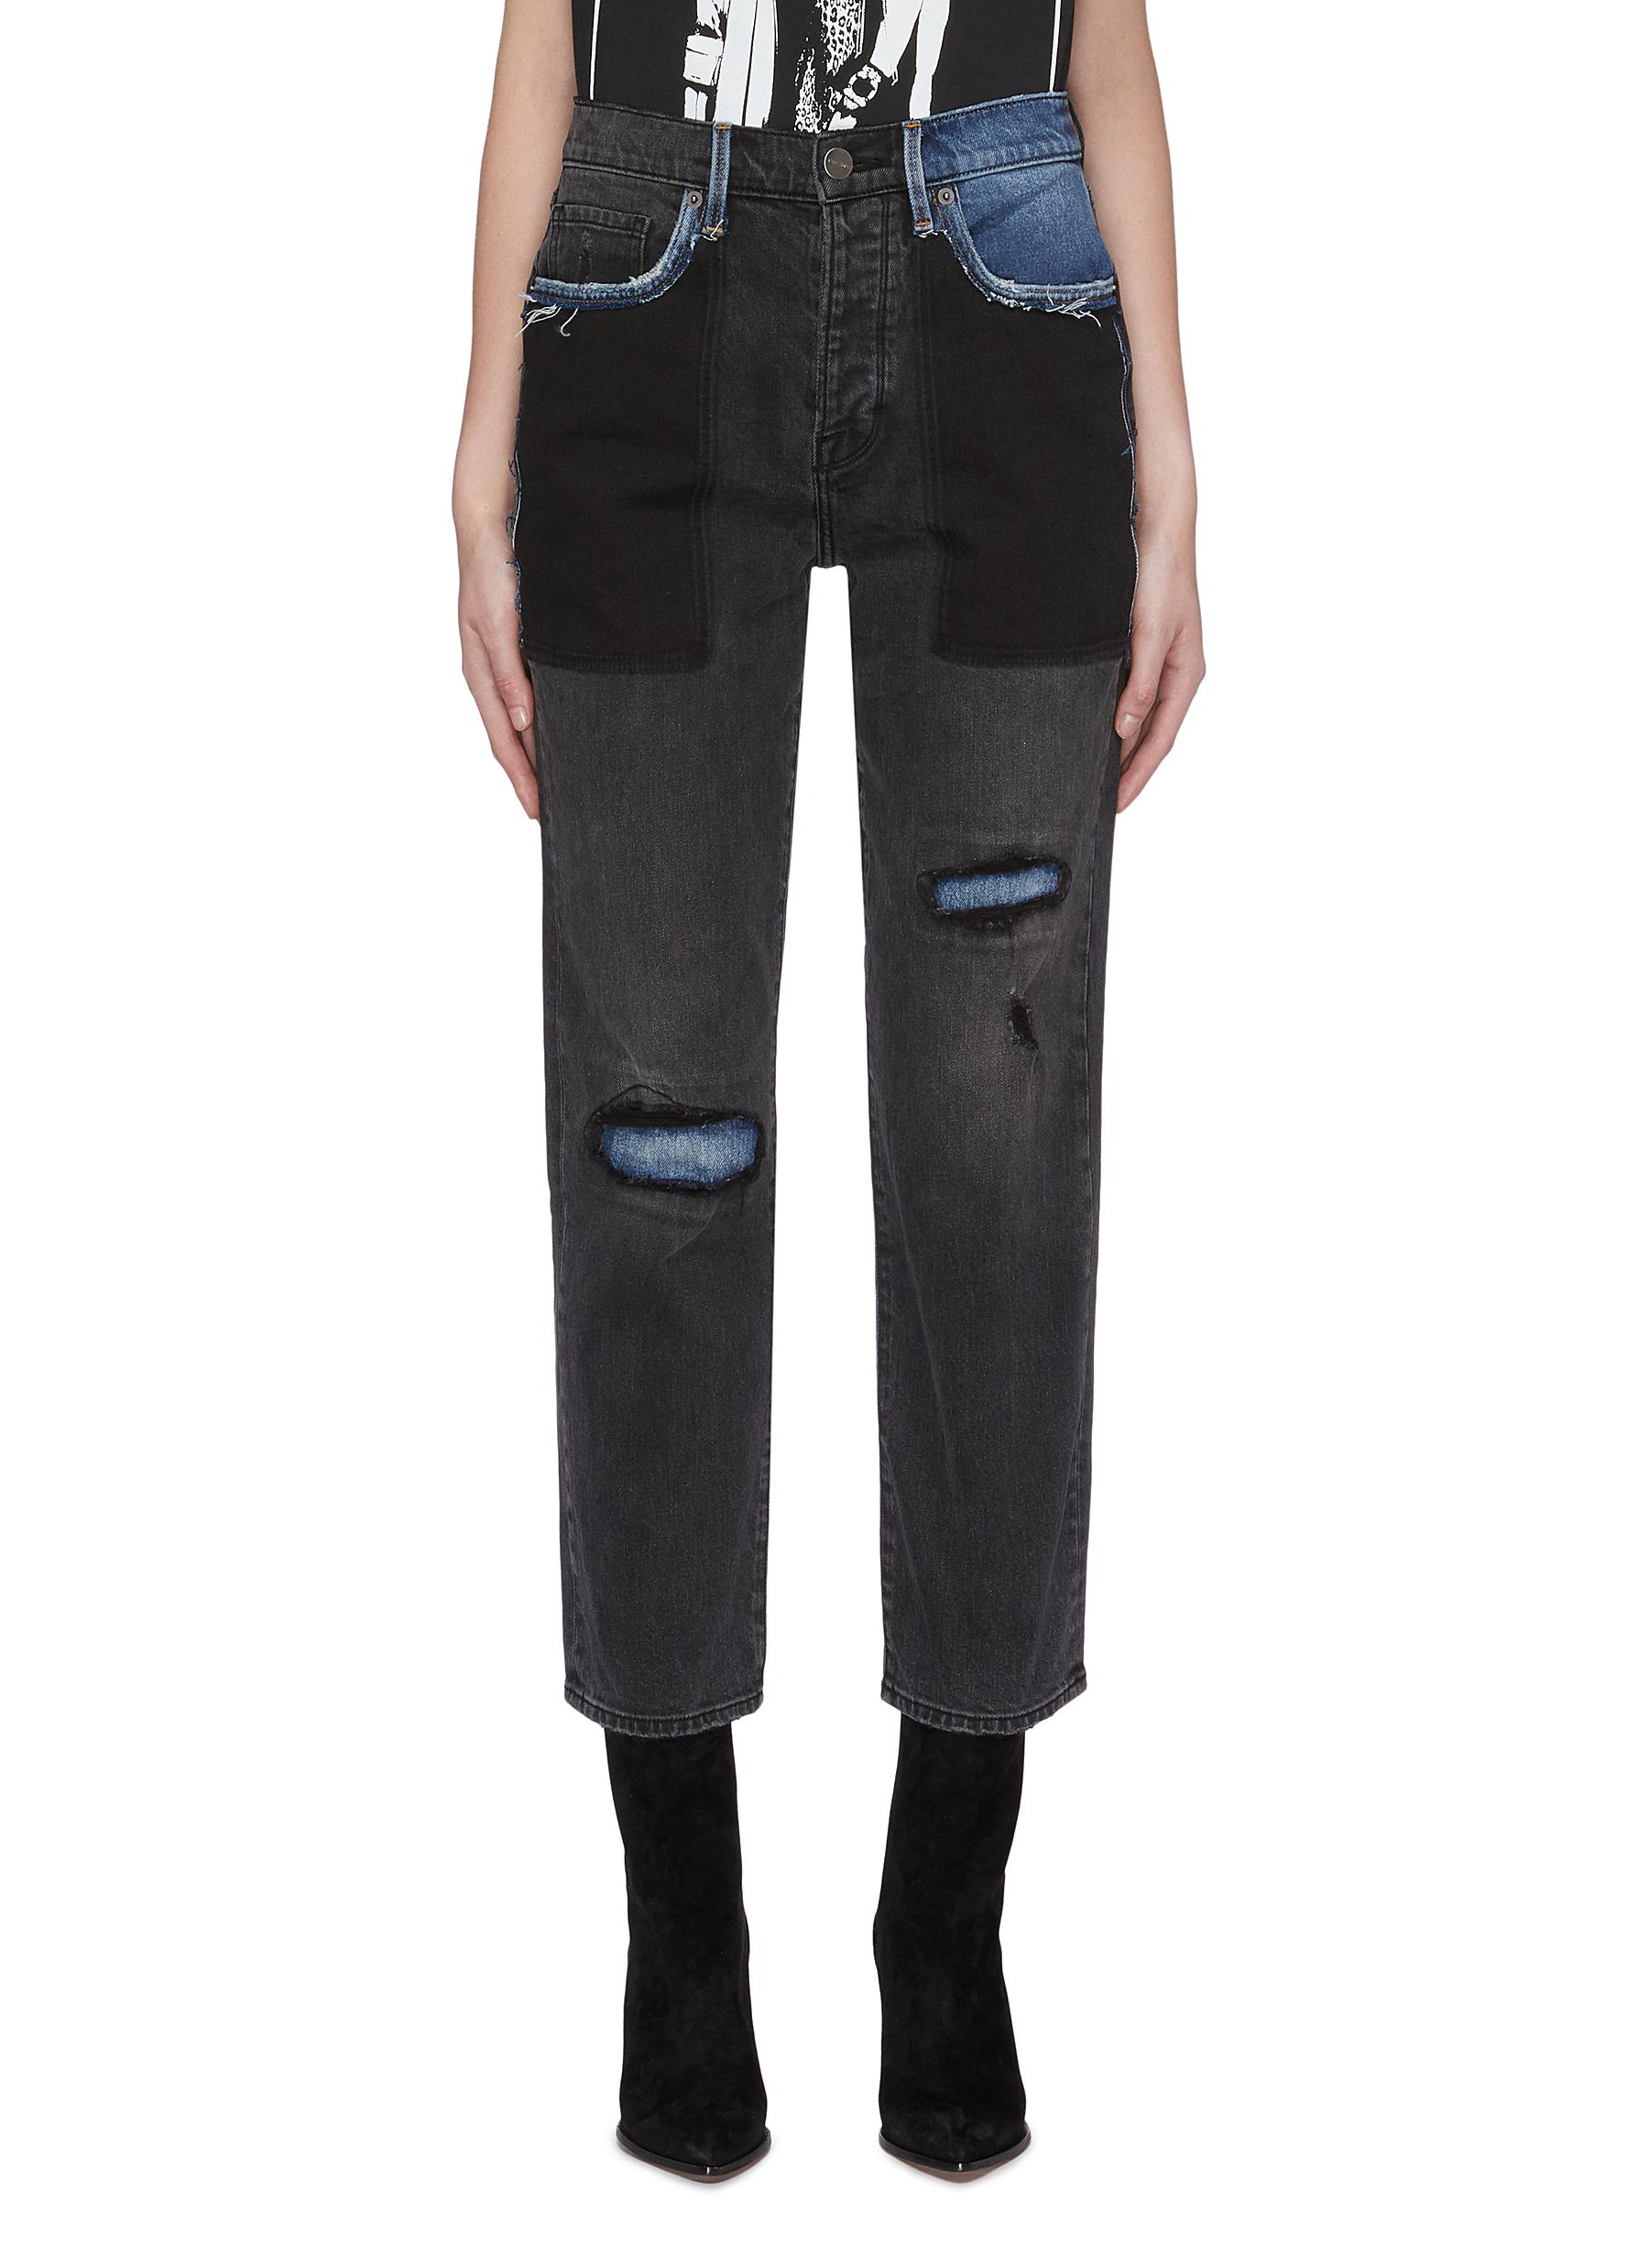 Le Original patchwork jeans by Frame Denim